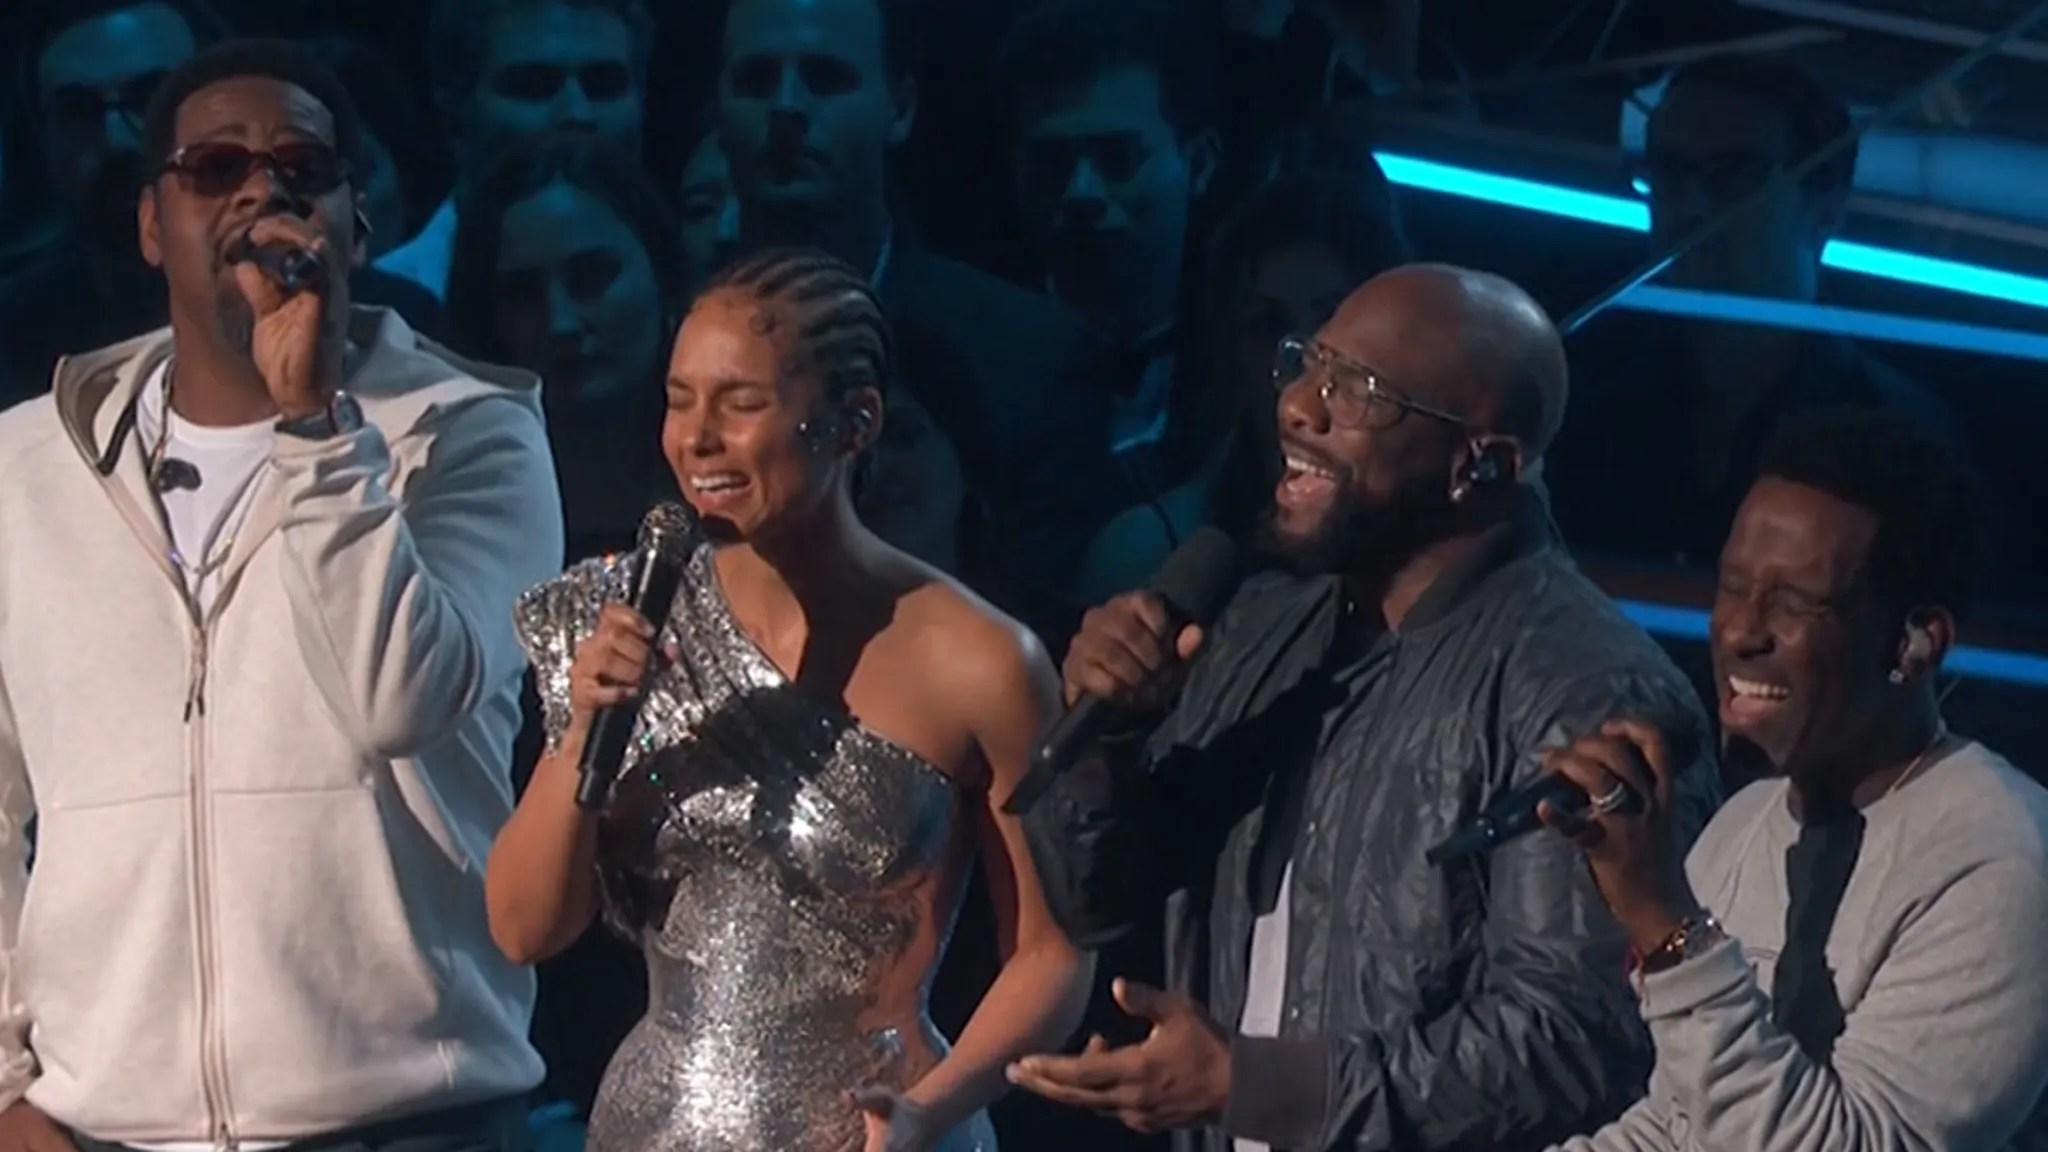 Alicia Keys Opens Grammys with Boyz II Men Tribute for Kobe Bryant